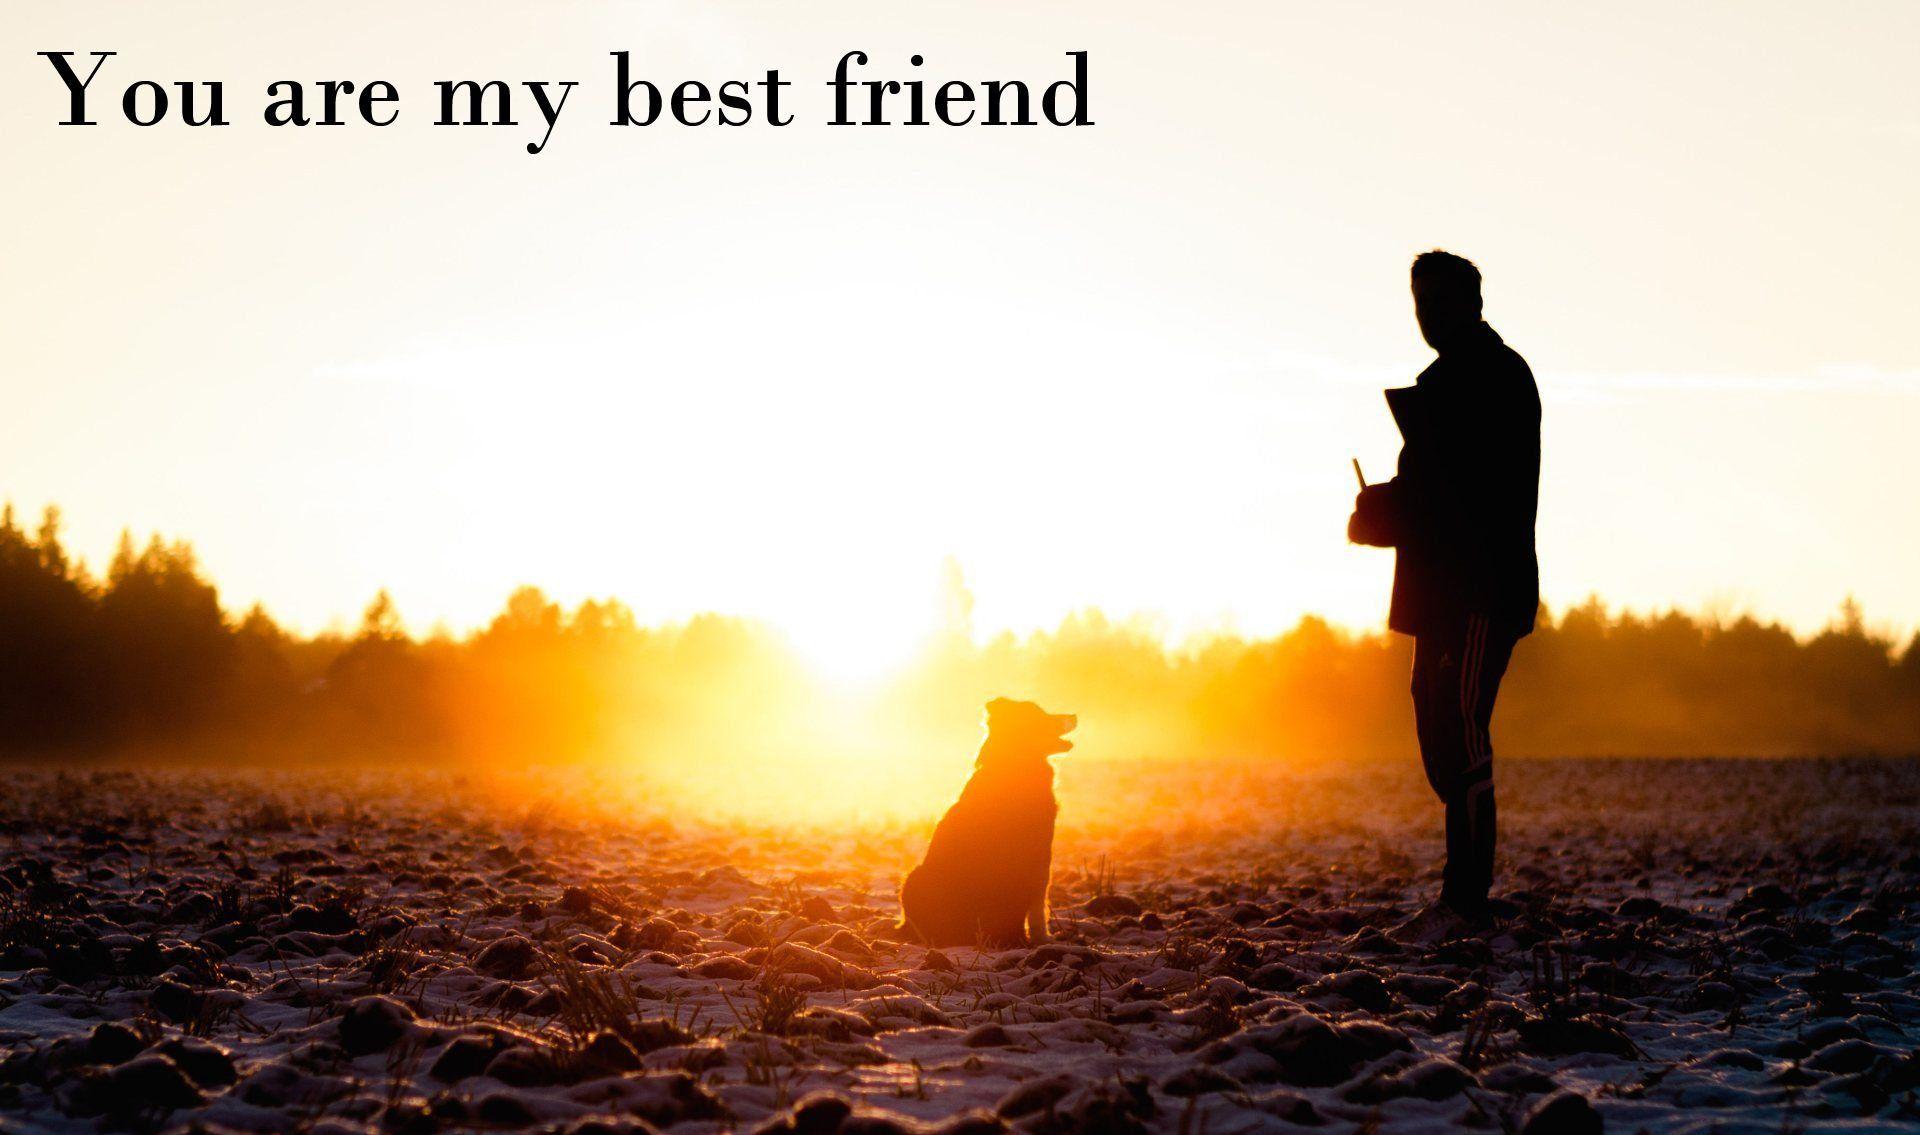 My best friend is my dog wallpaper 1920x1135